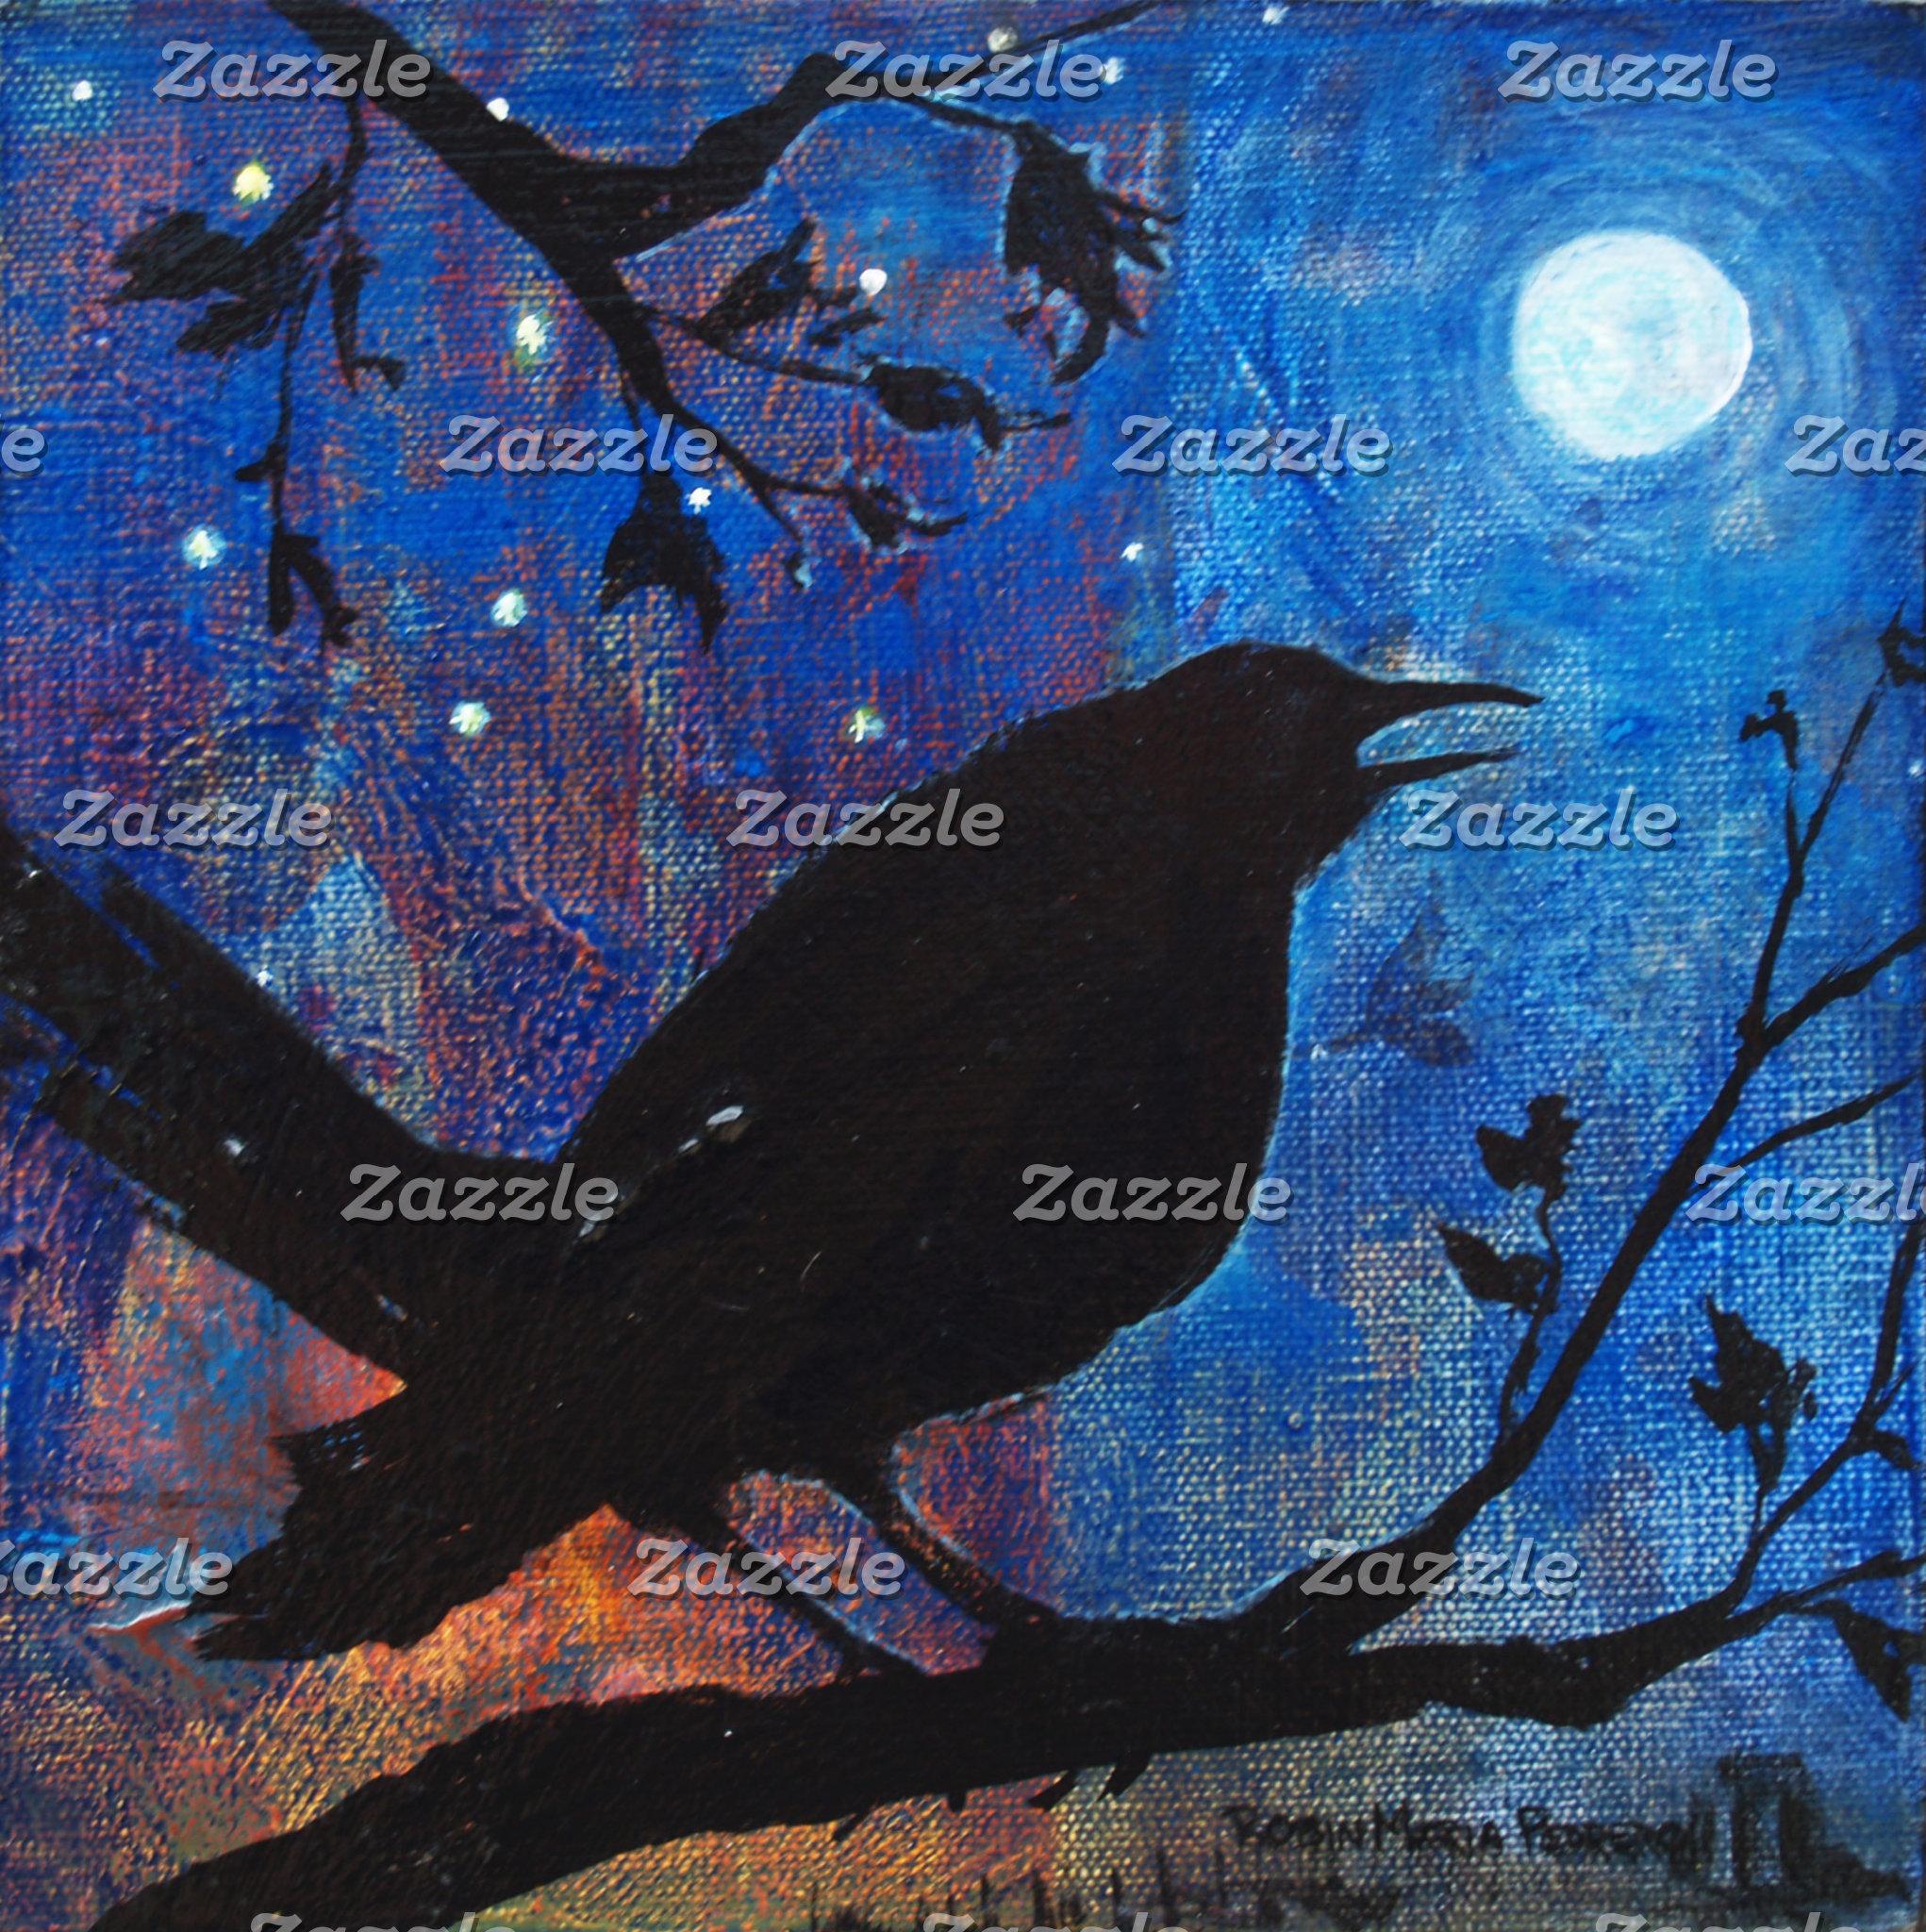 Crows Ravens Blackbirds